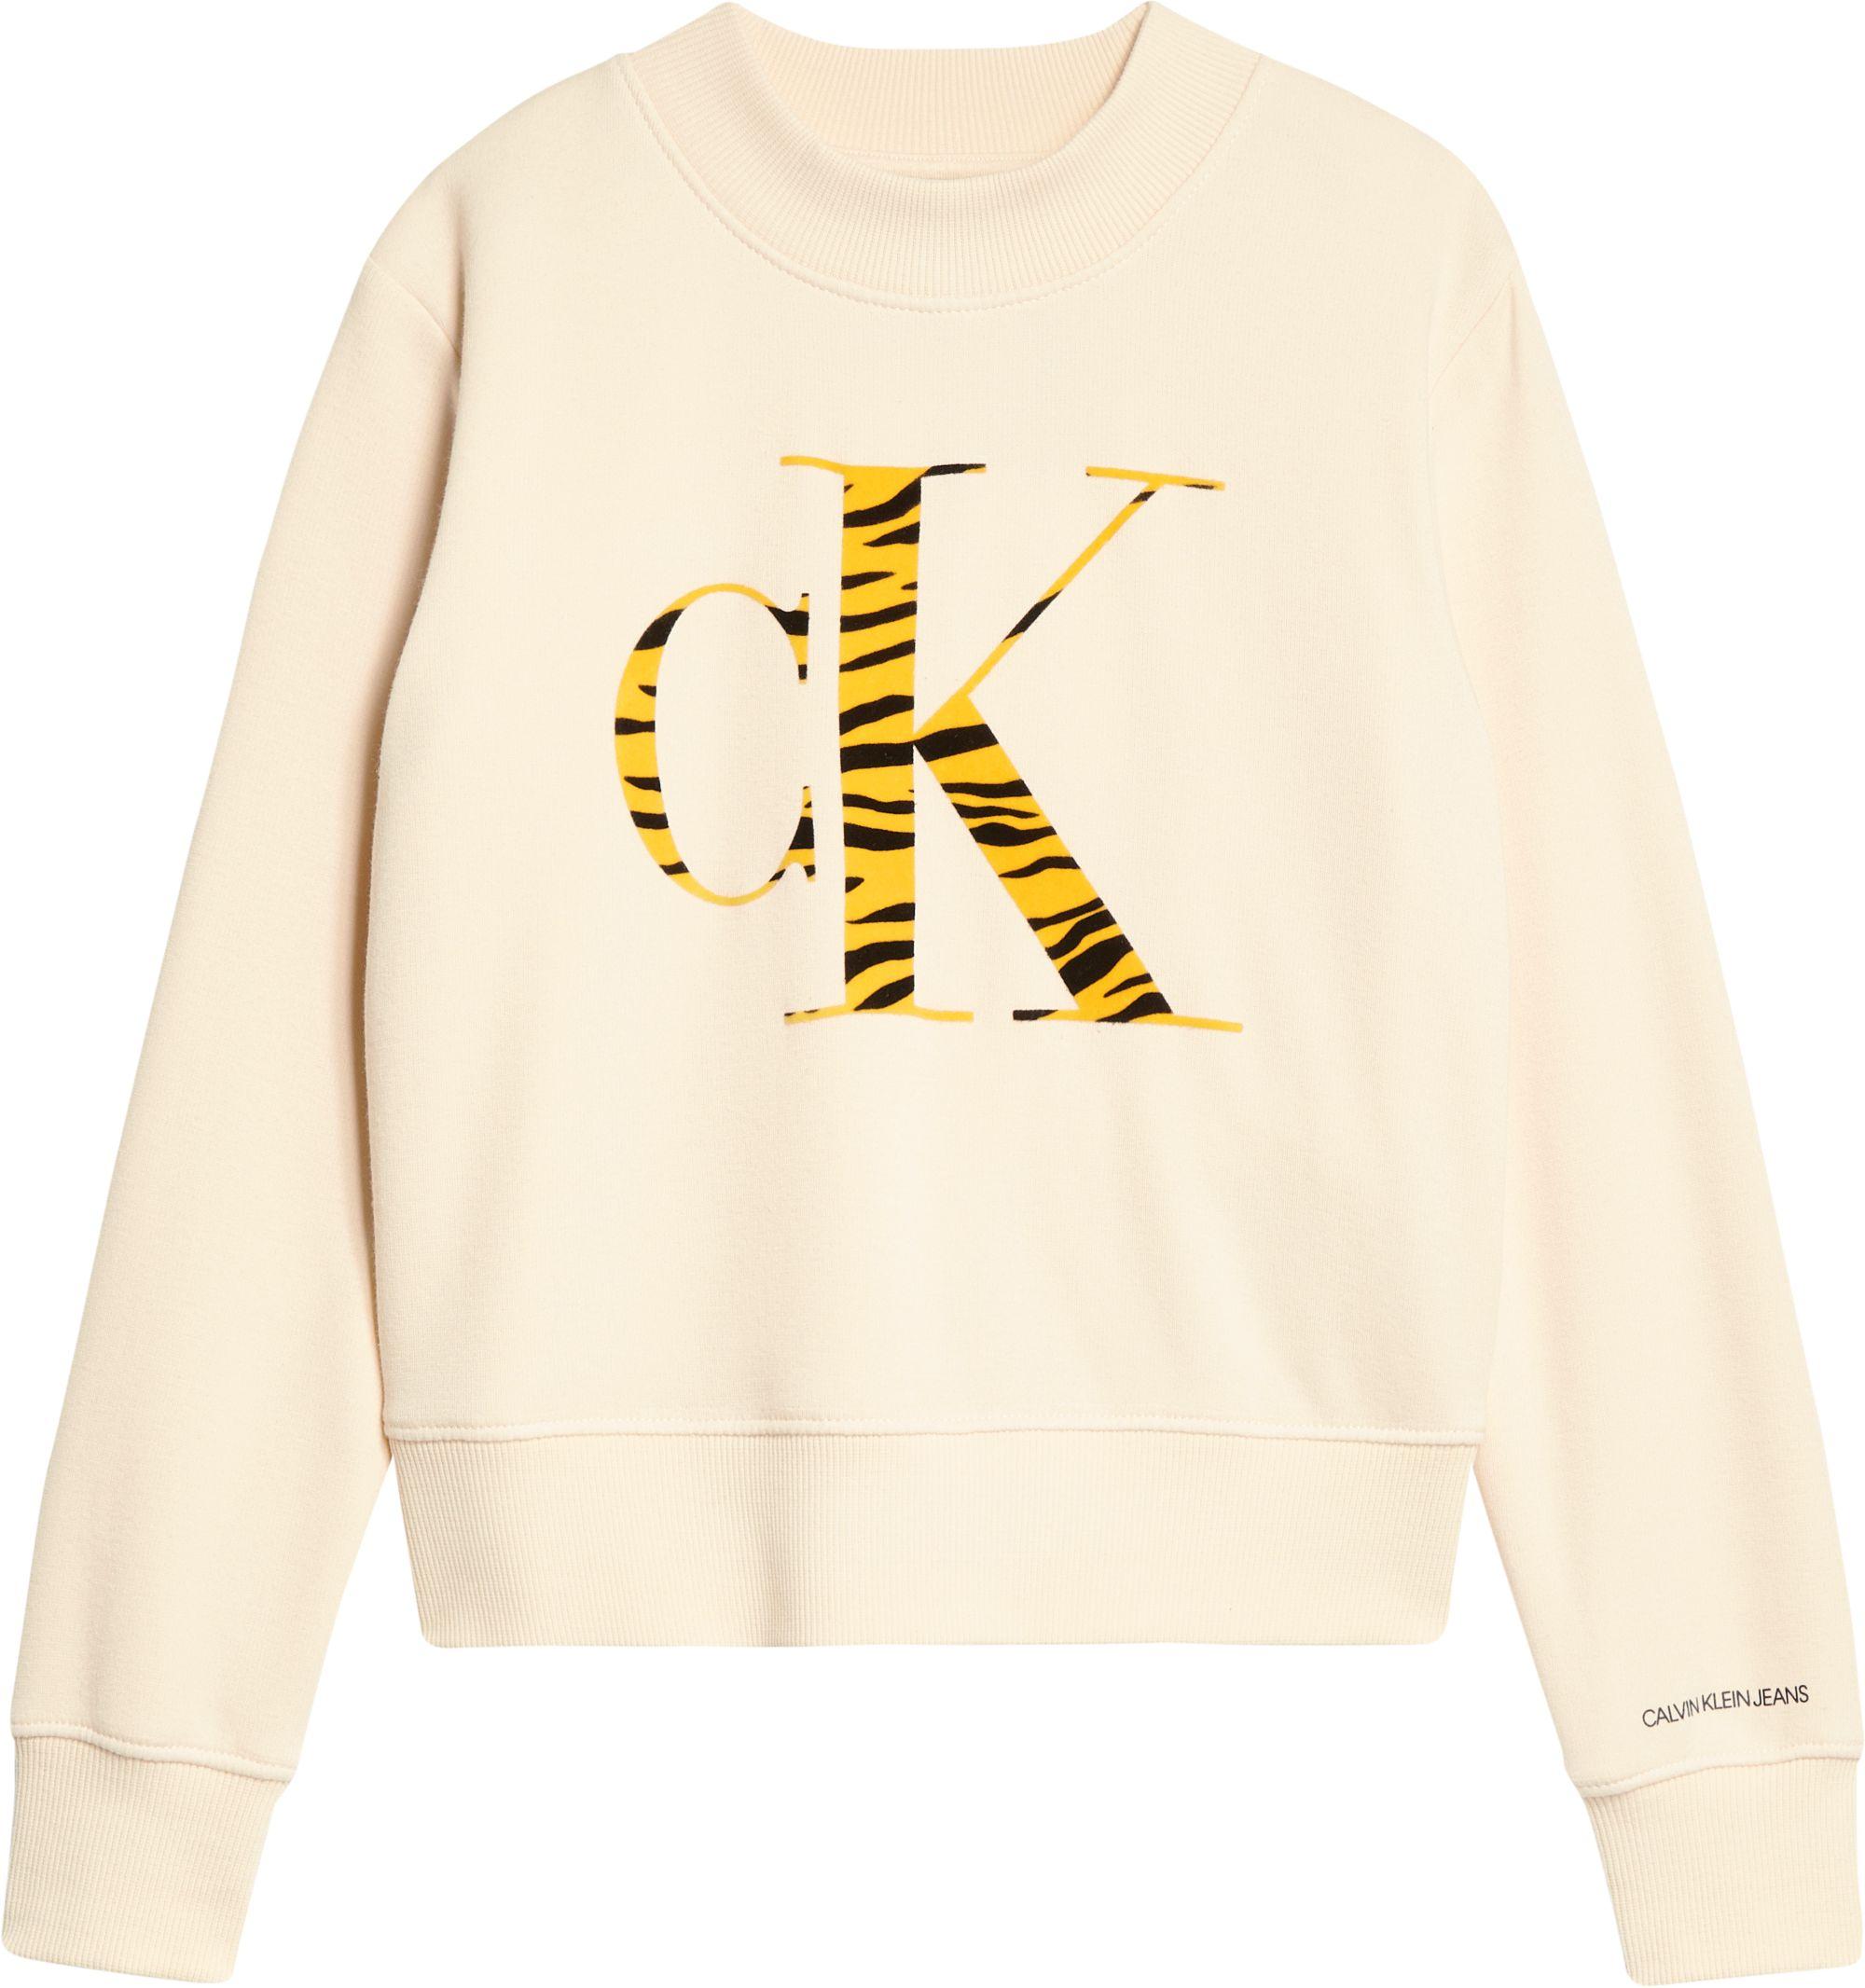 Calvin Klein, Urban Animal Flock collegepaita